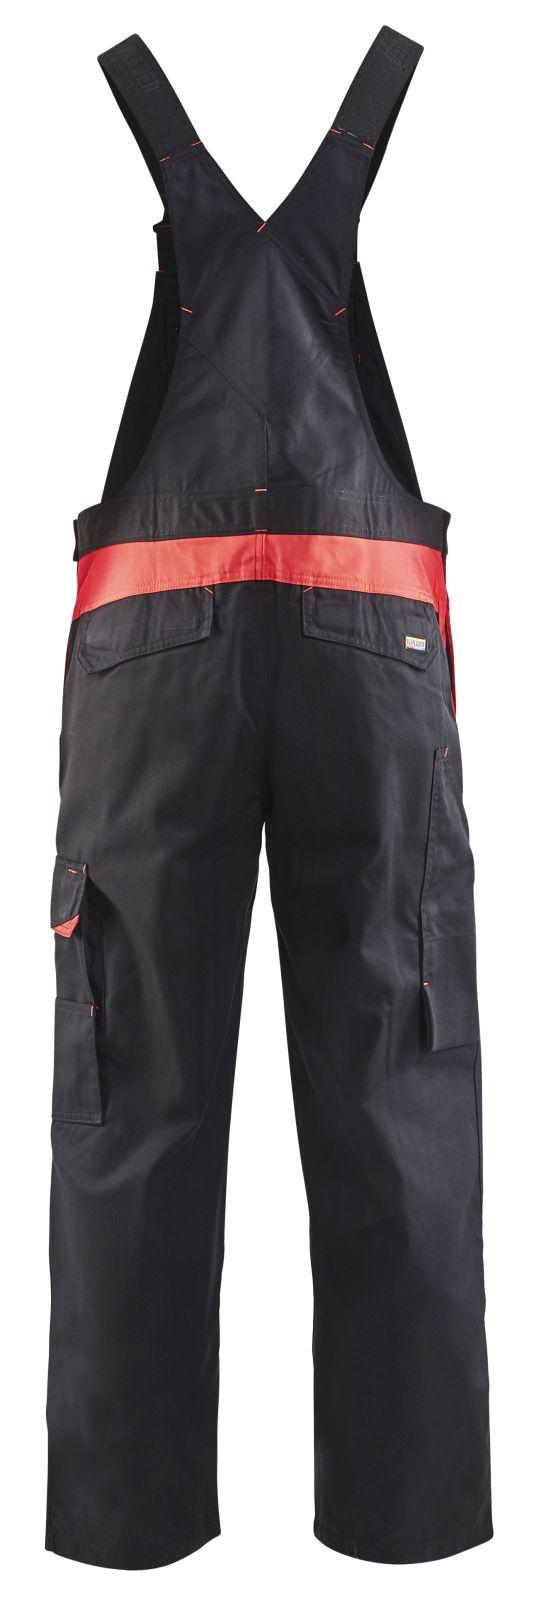 Blaklader Amerikaanse overalls 26641800 zwart-rood(9956)